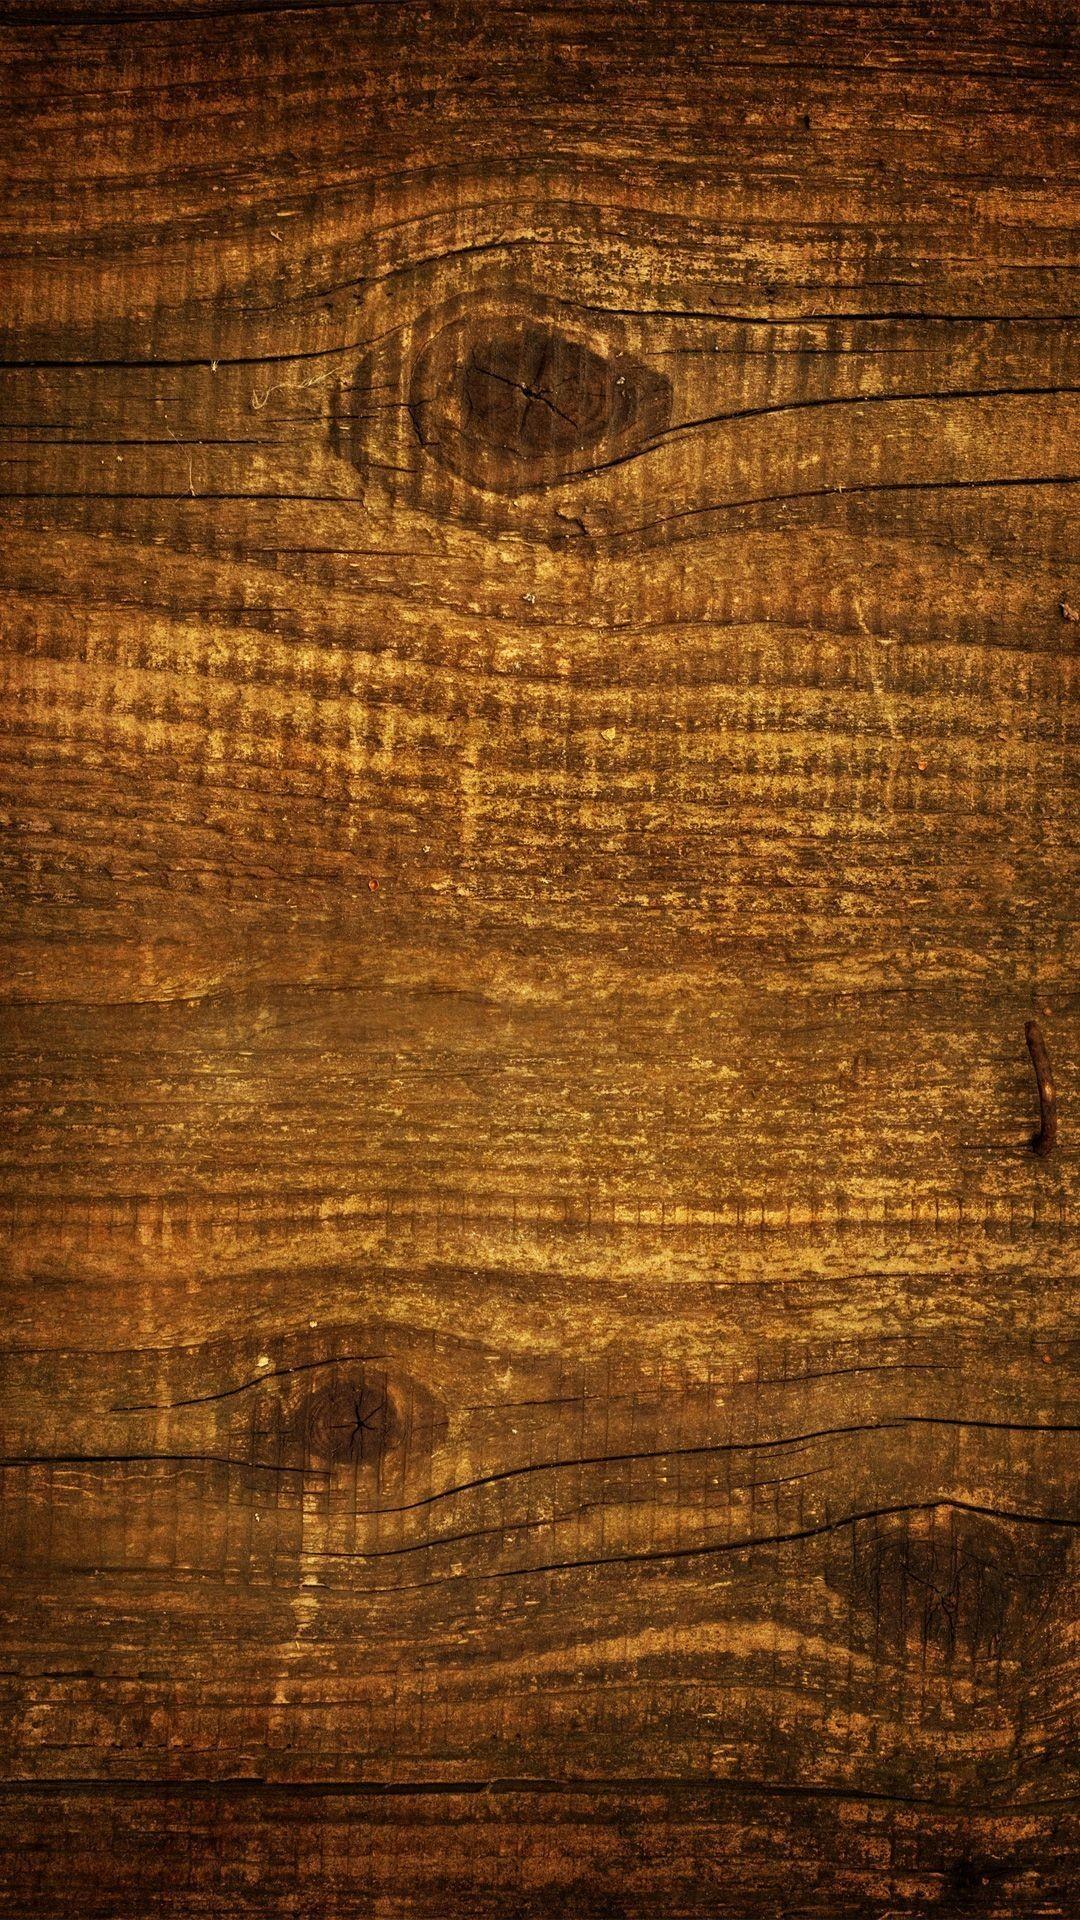 finest wood grain with wood grain wallpaper.